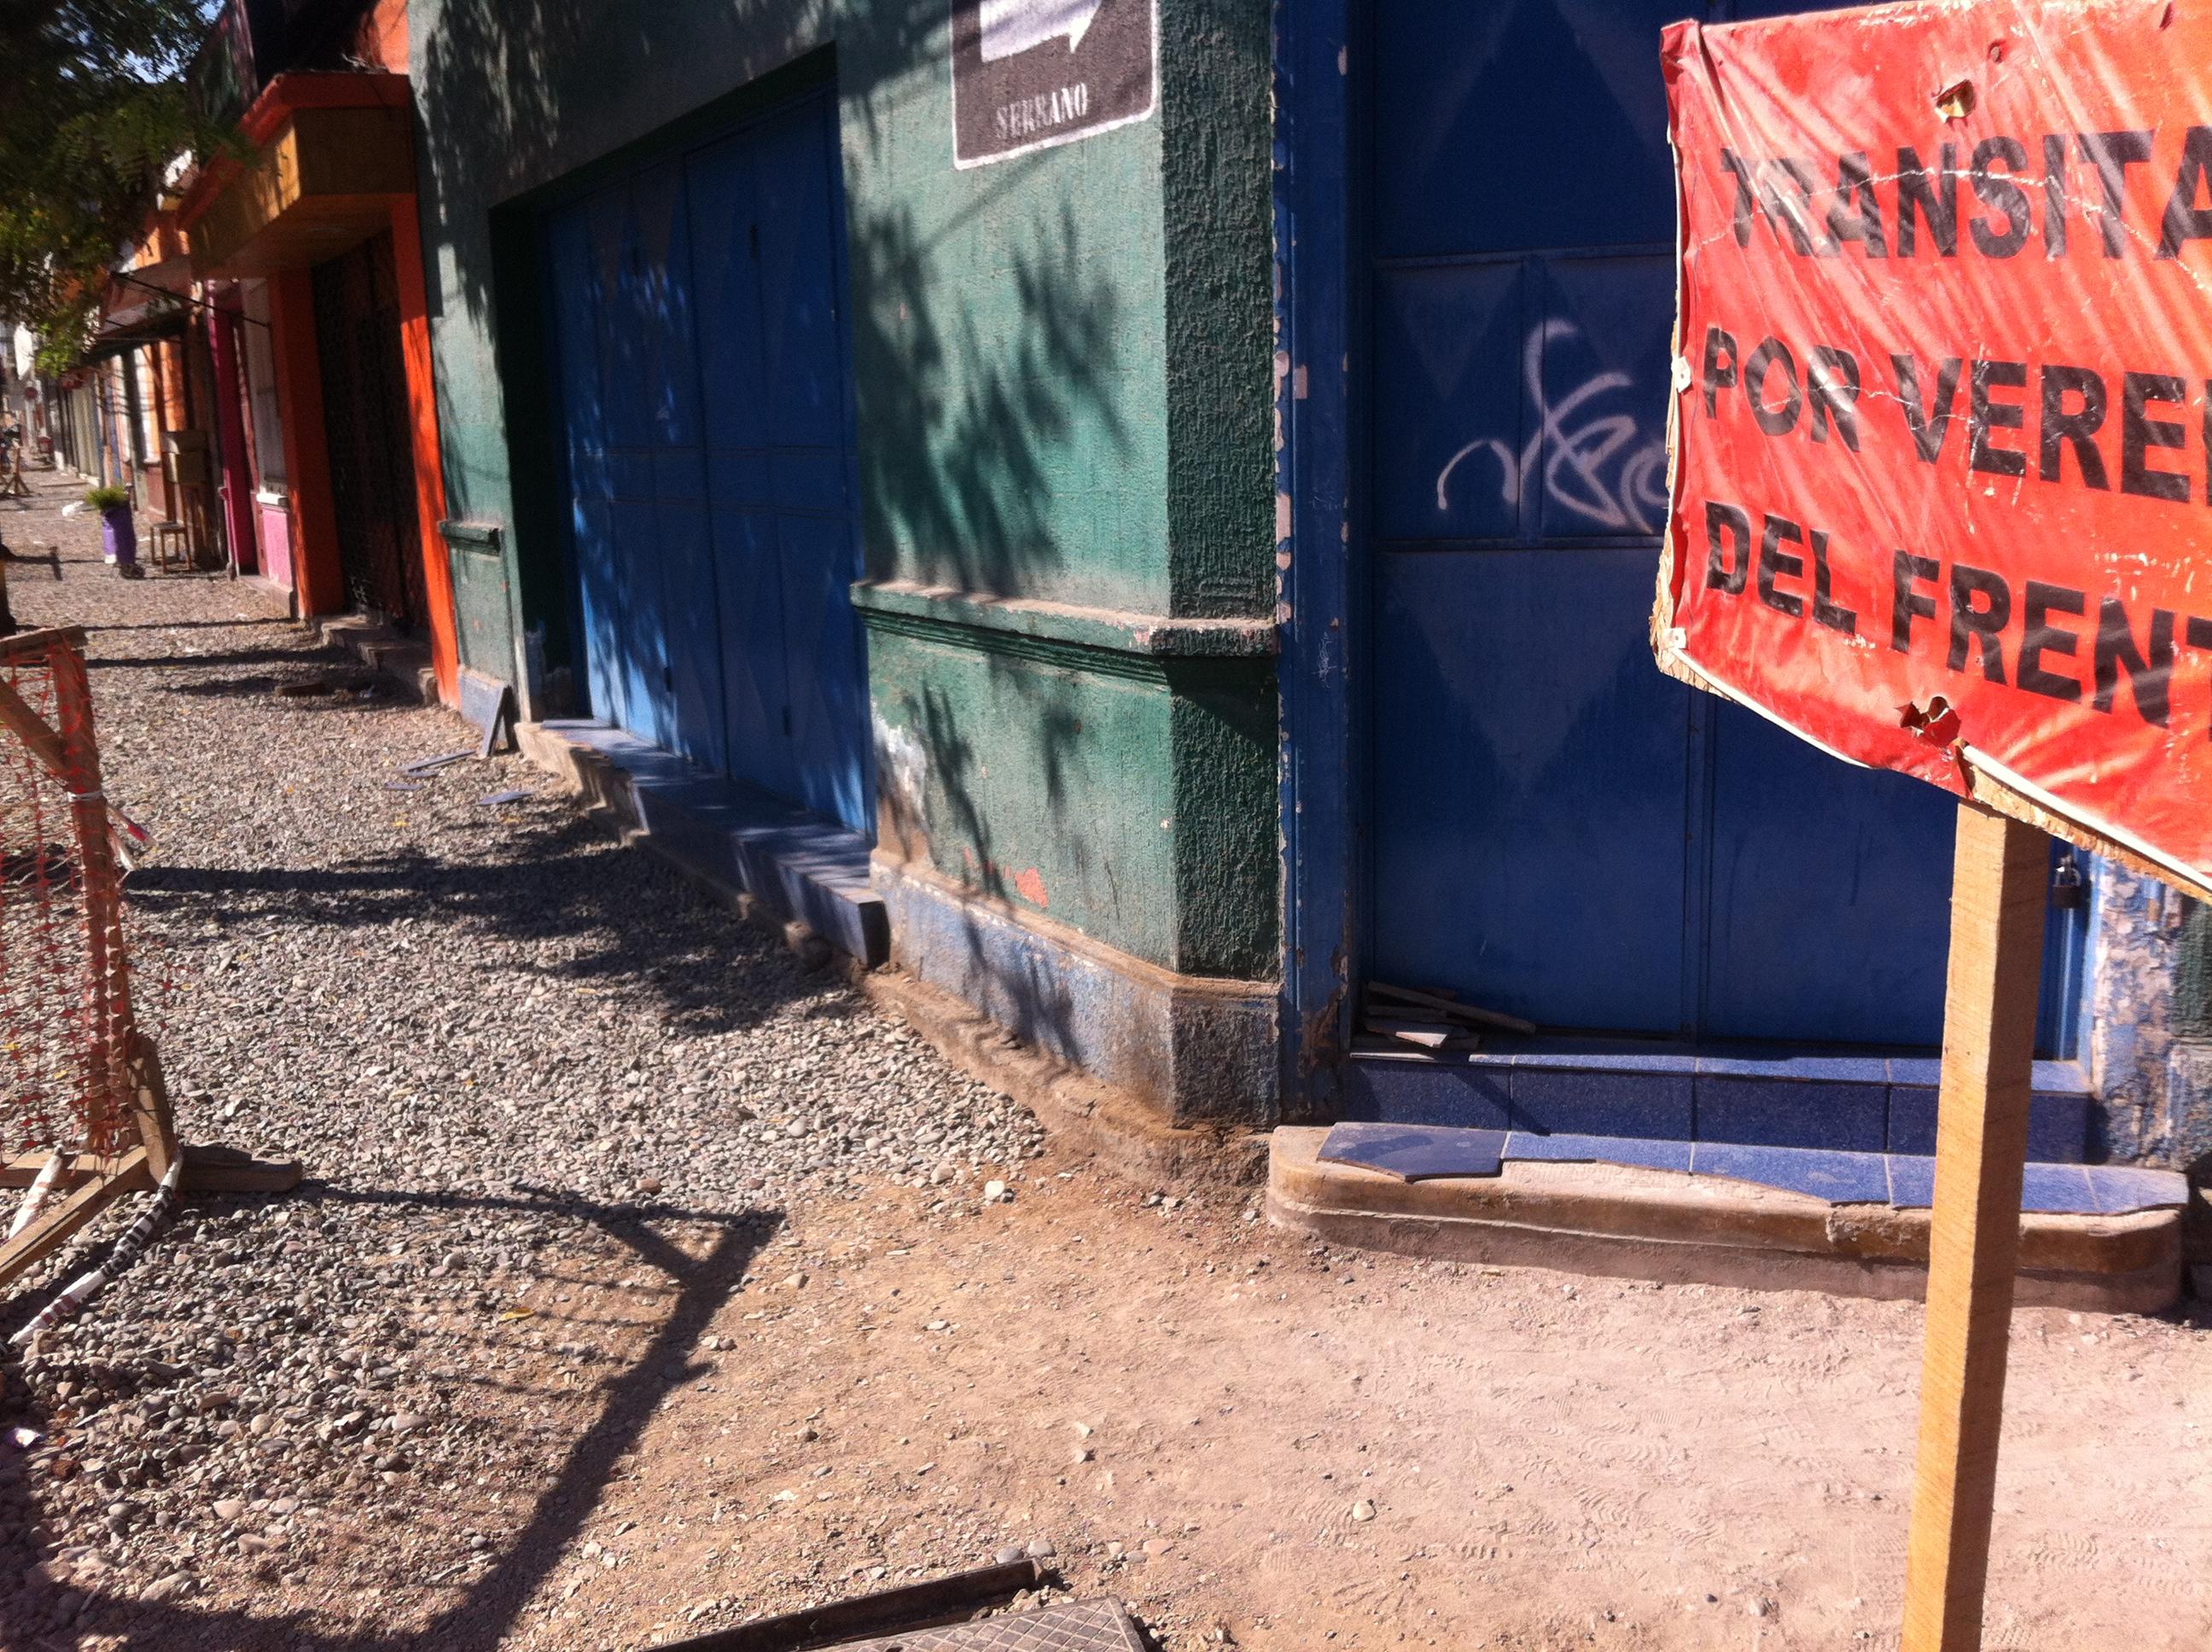 Aprueban recursos para terminar proceso de reparación de veredas de Vallenar